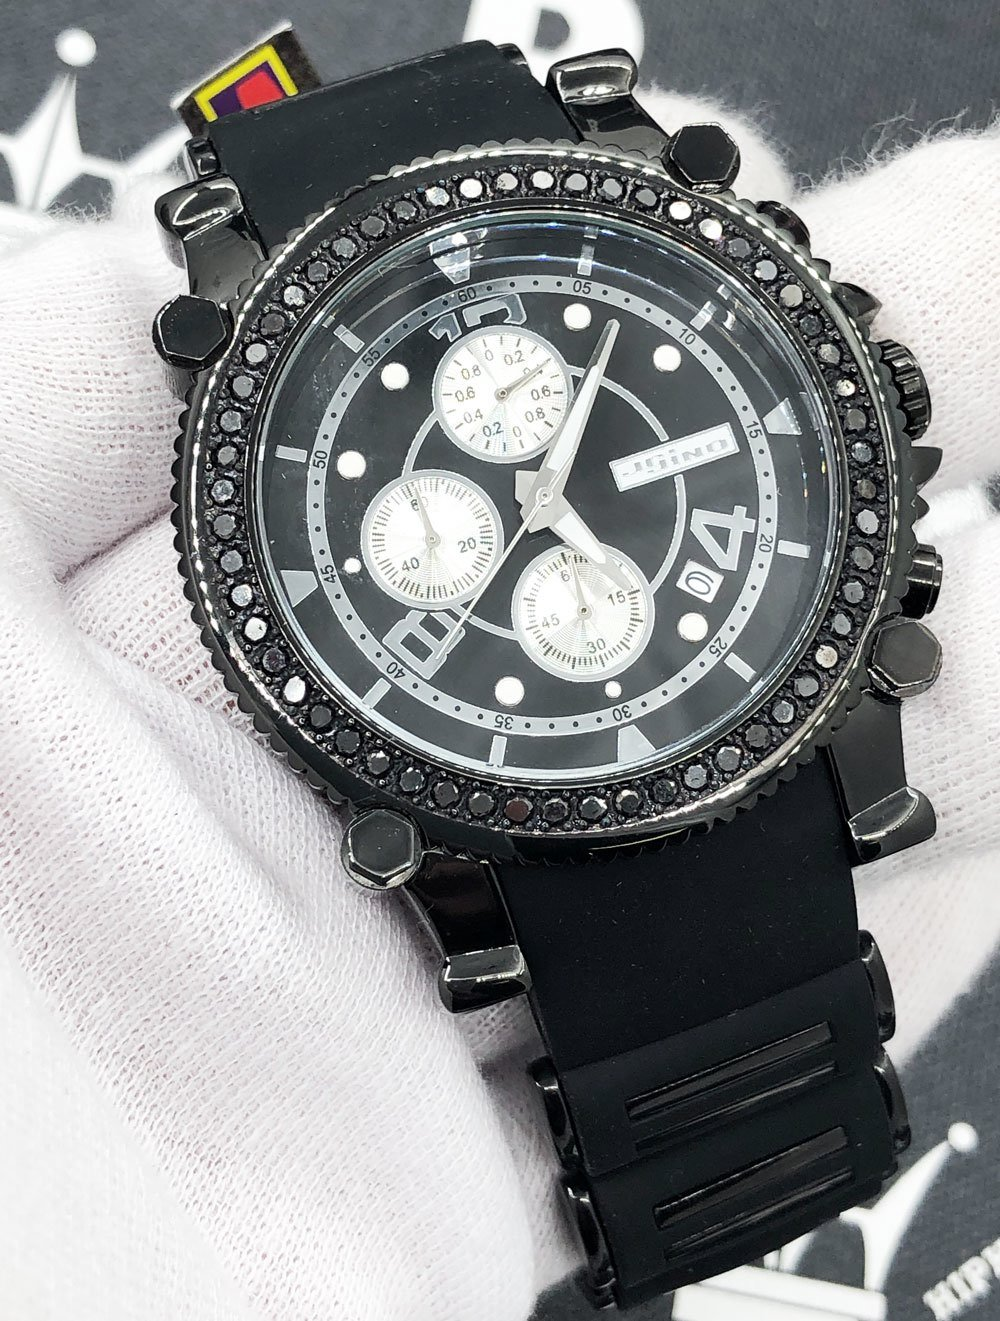 Rubber Strap 2.25 Carat Black Diamond Hip Hop Watch JoJino